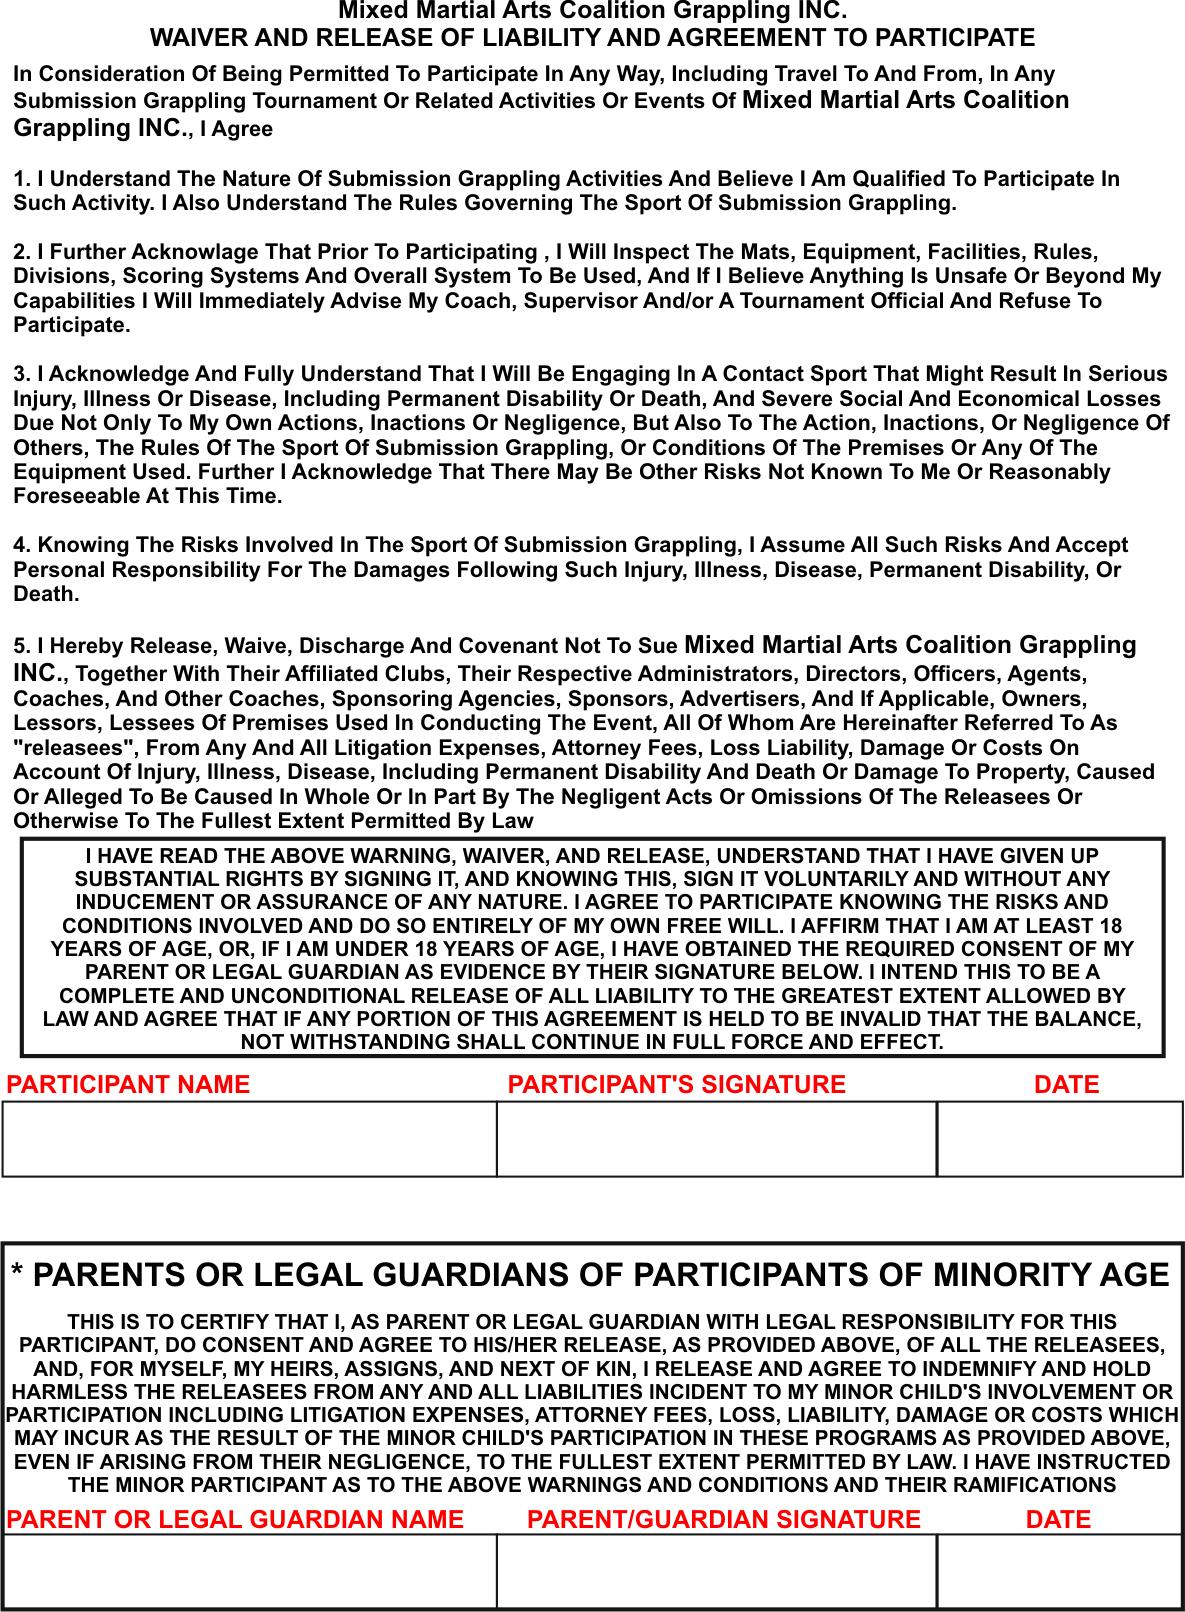 mmac-liability-waiver